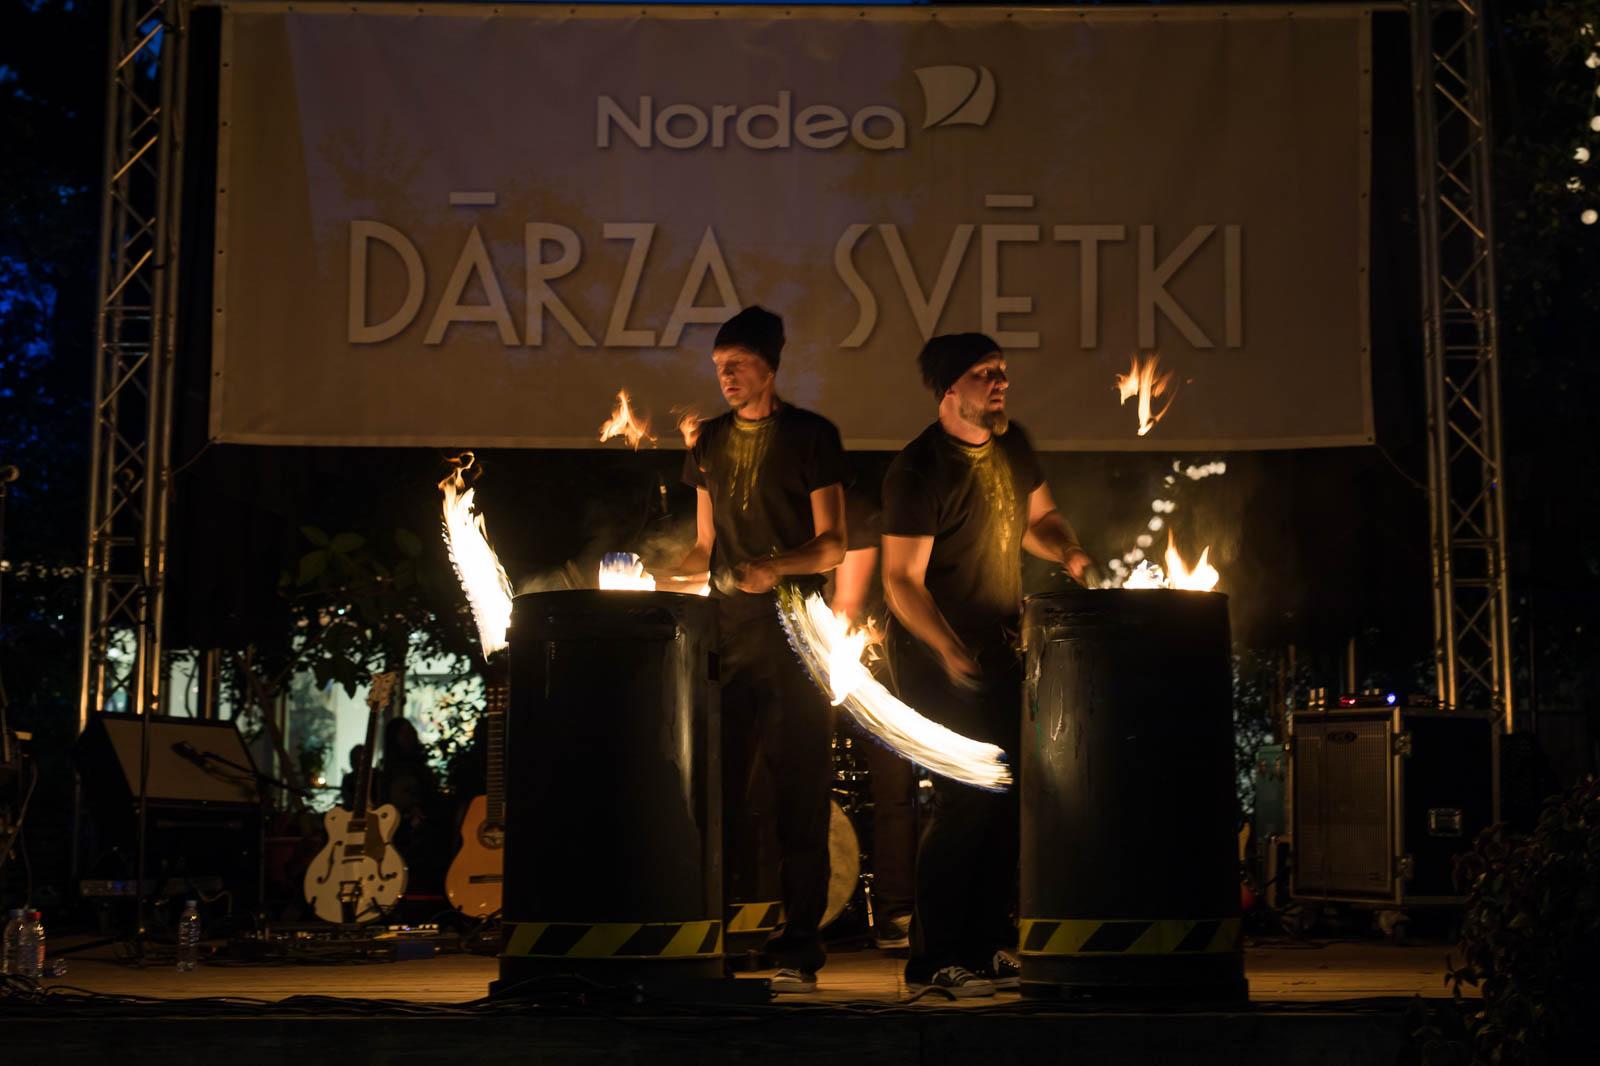 Nordea_DarzaSvetki_s-479